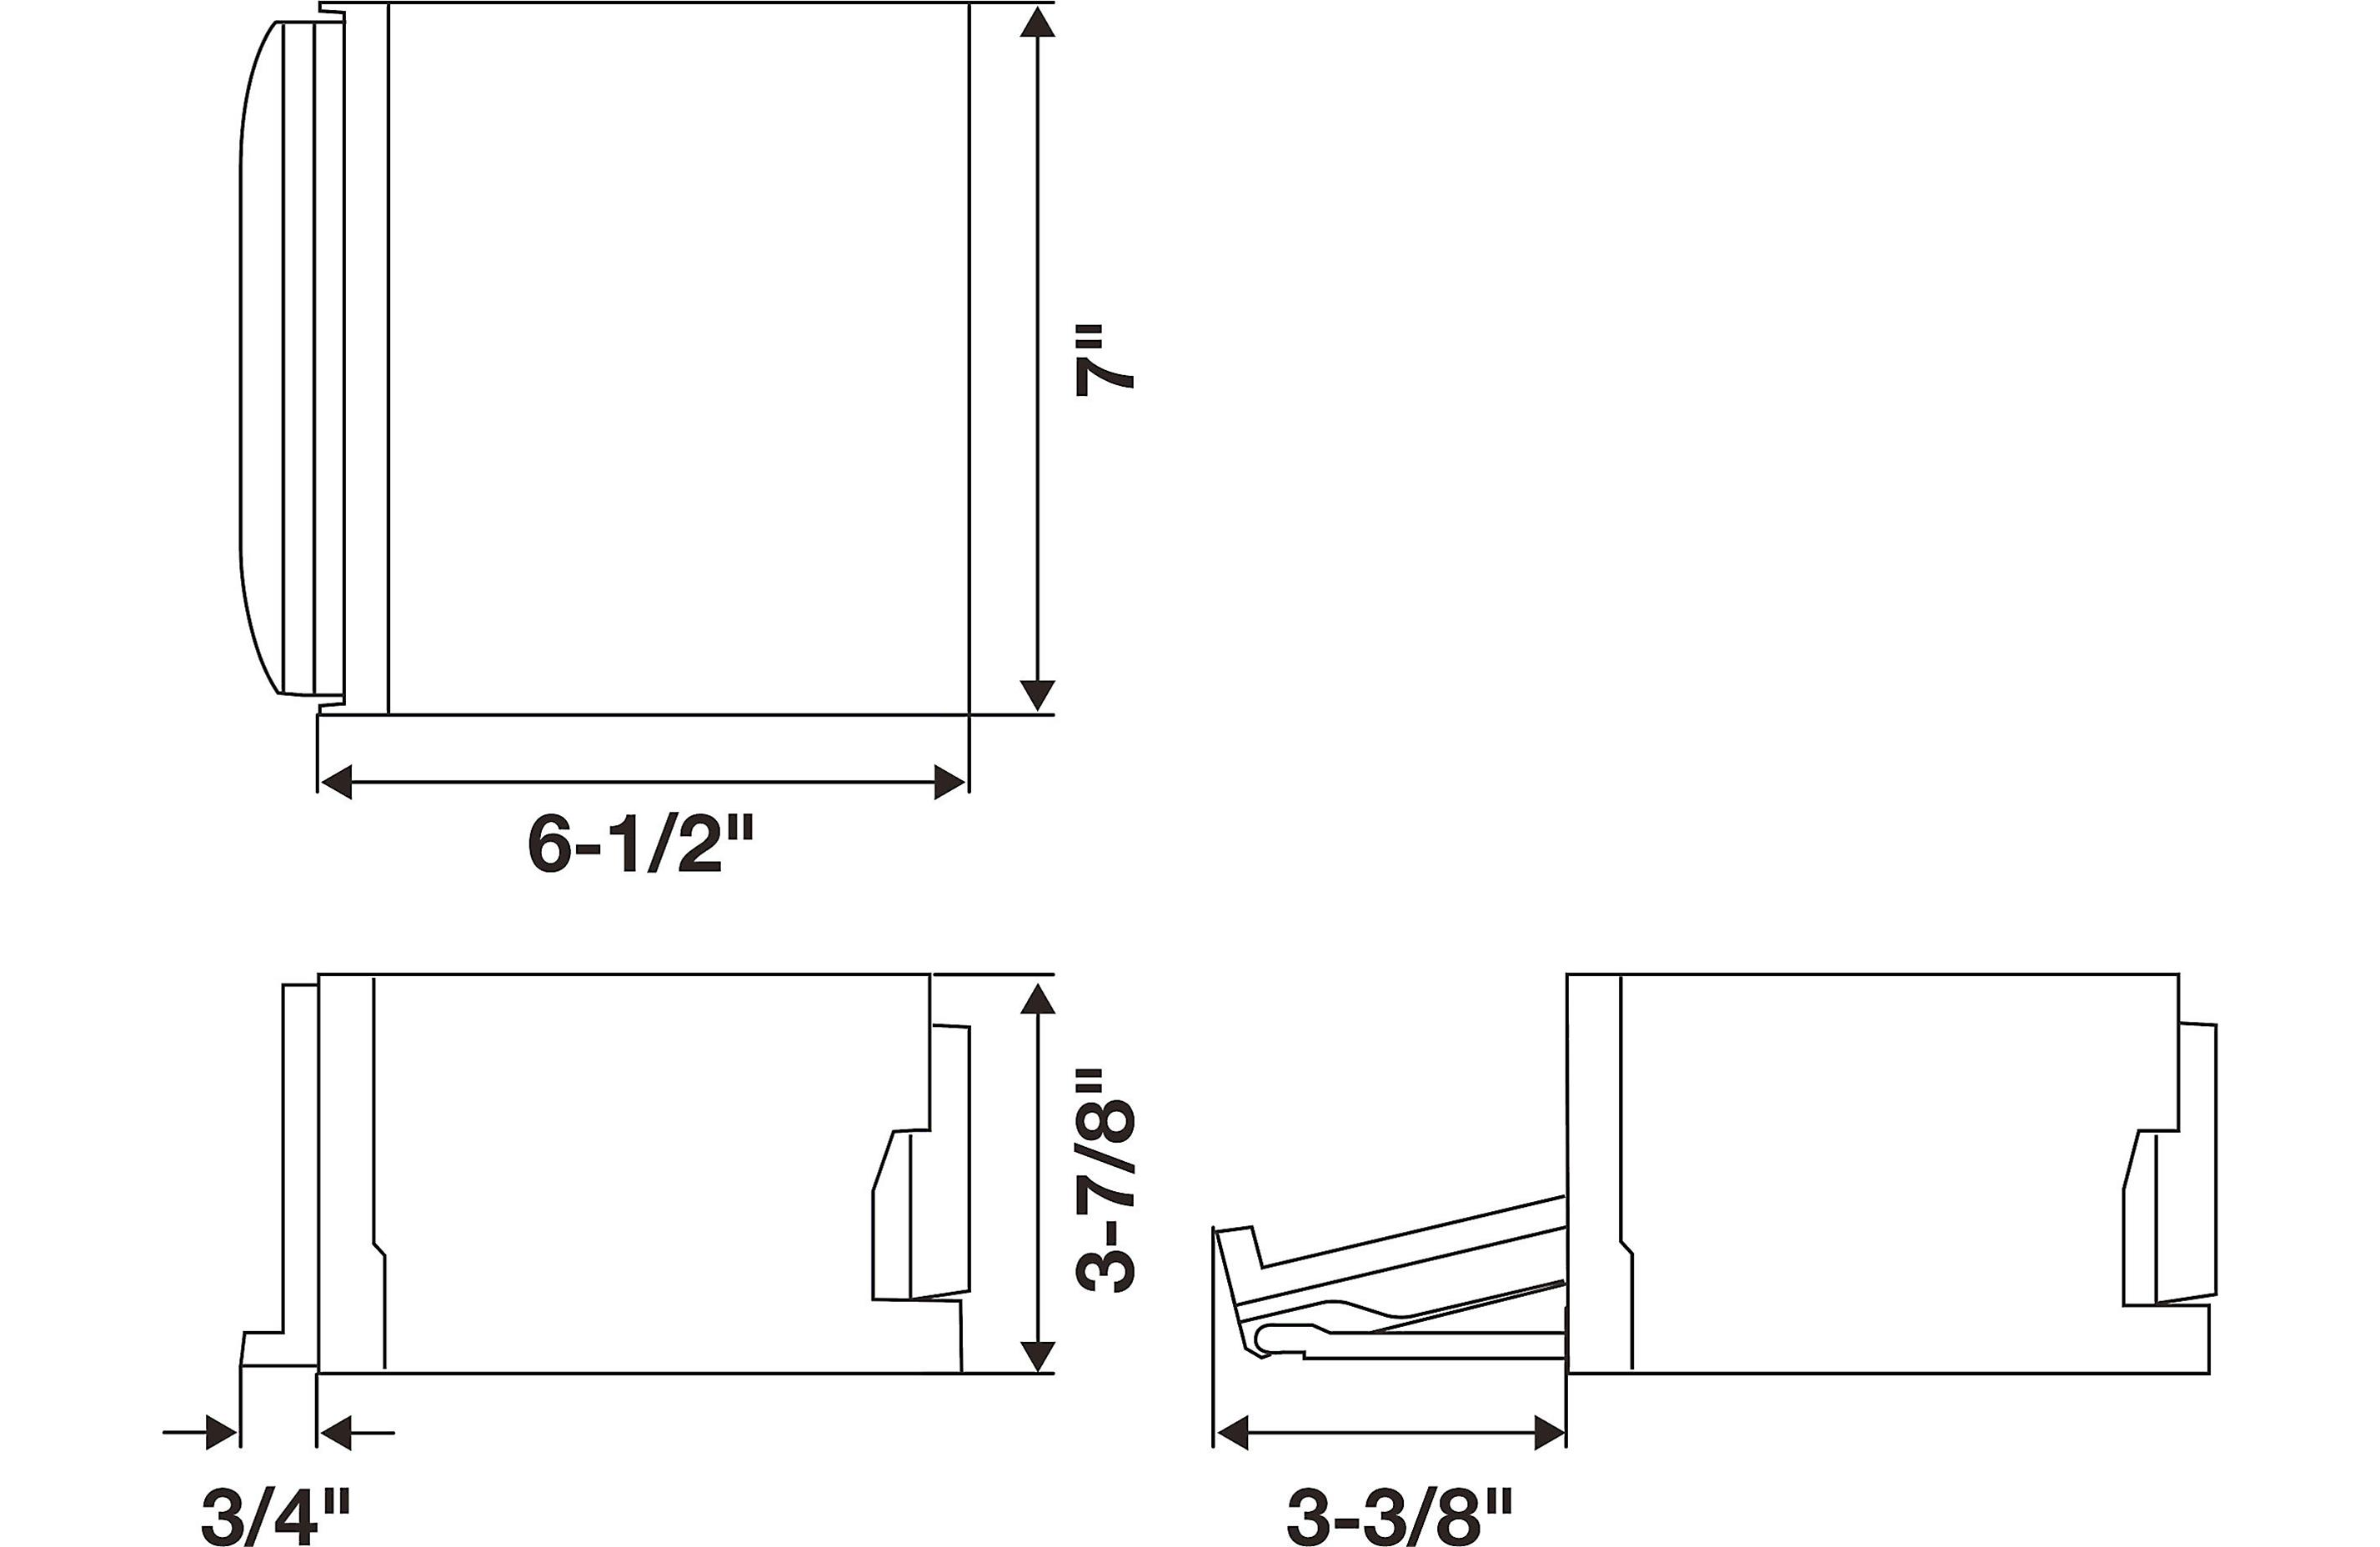 pioneer avh p4000dvd wiring diagram 2 virginia plan vs new jersey venn x1700s plugs